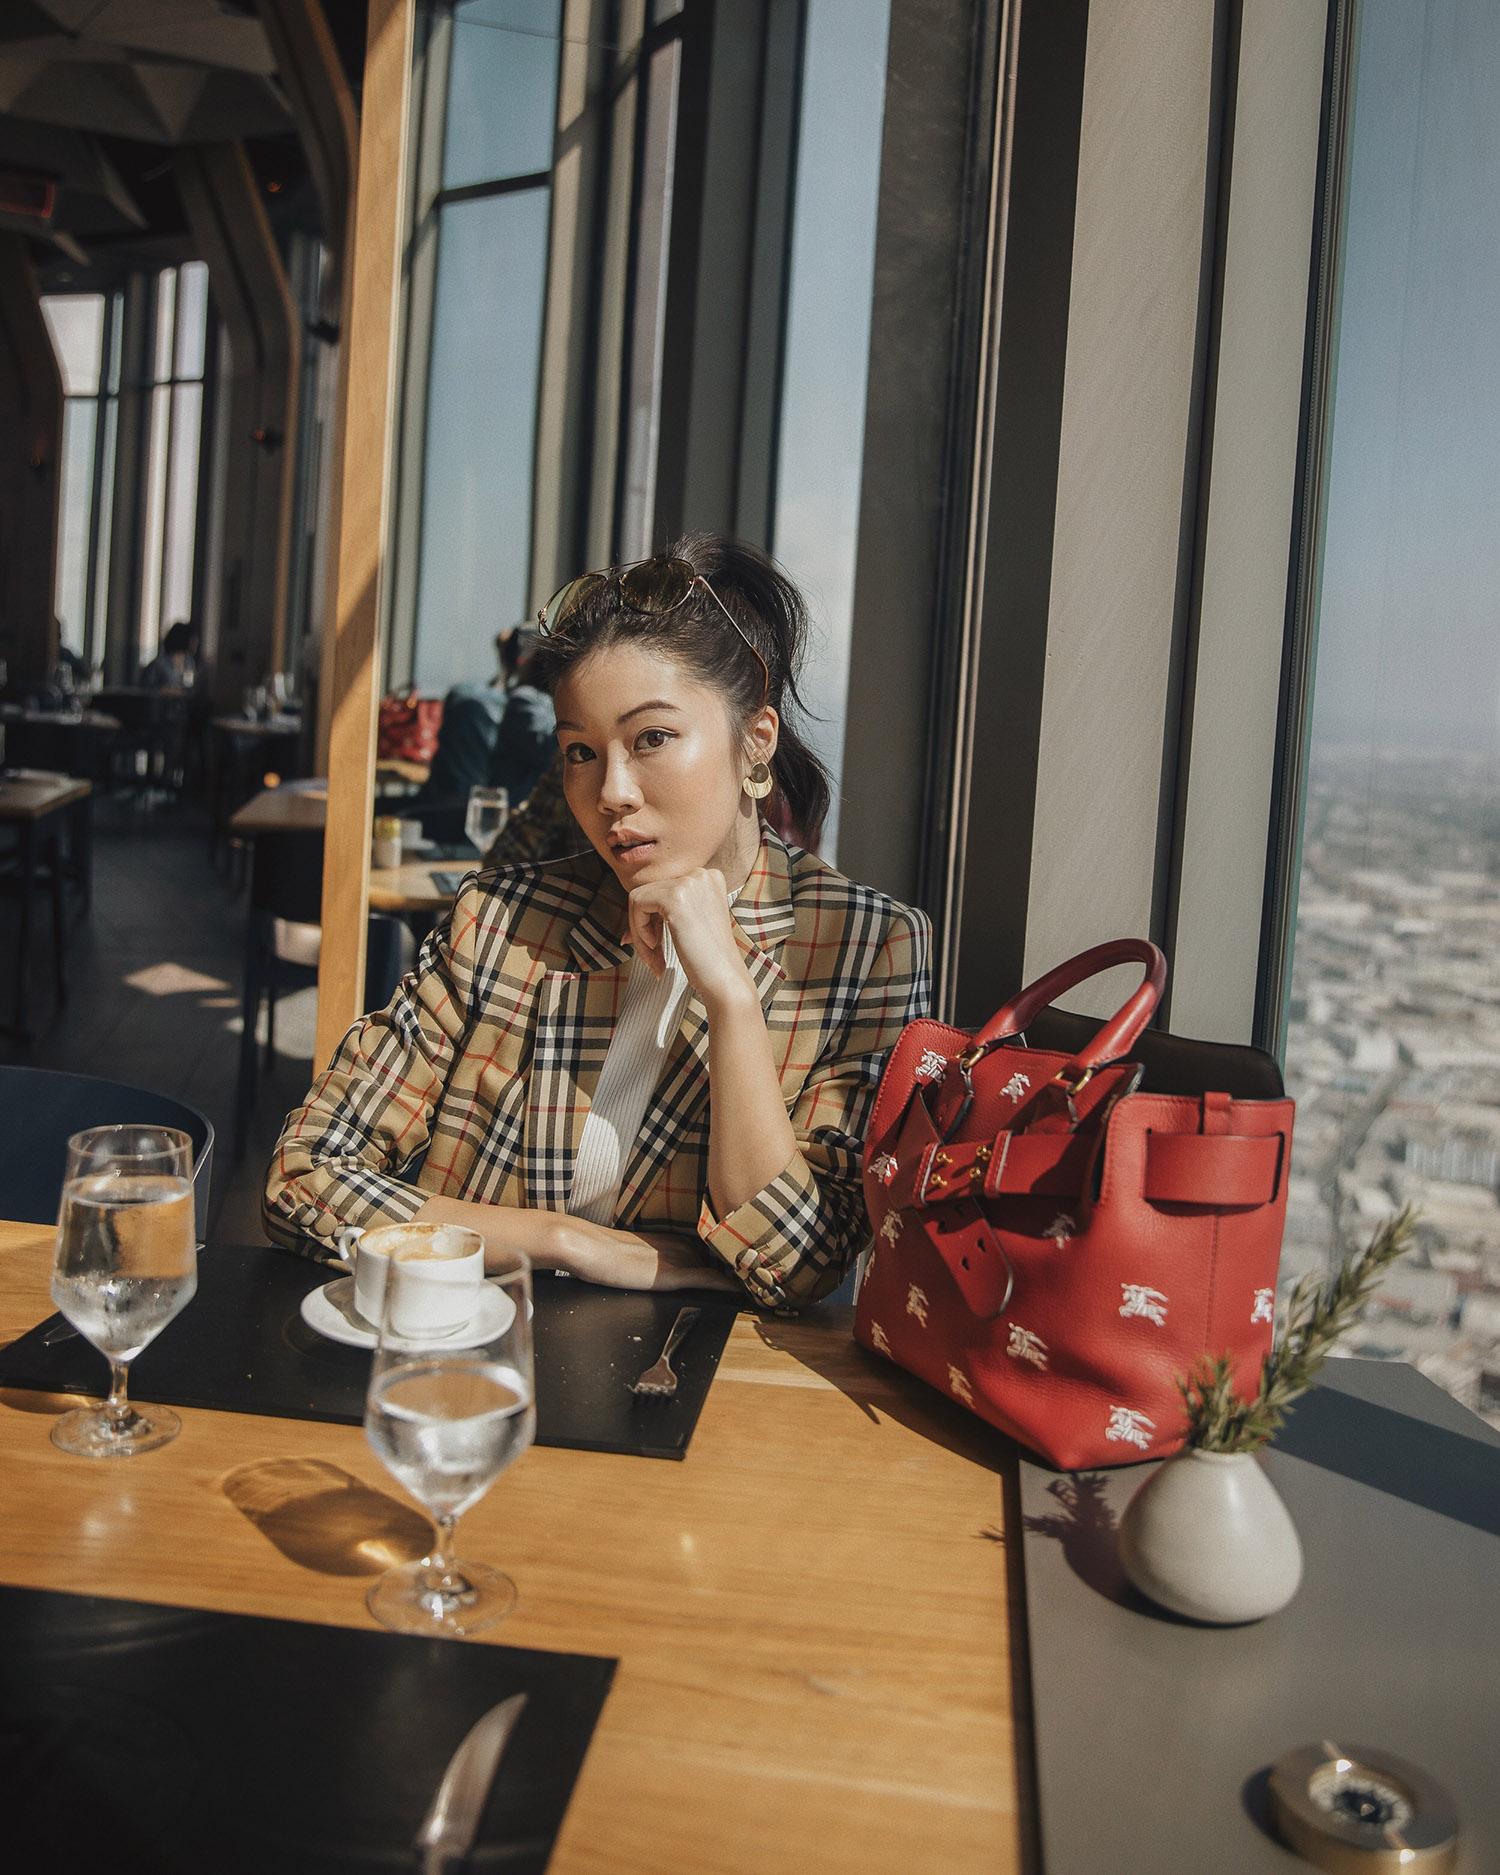 Jenny Tsang of Tsangtastic wearing burberry heritage check blazer exclusive belt bag plaid blazer outfit